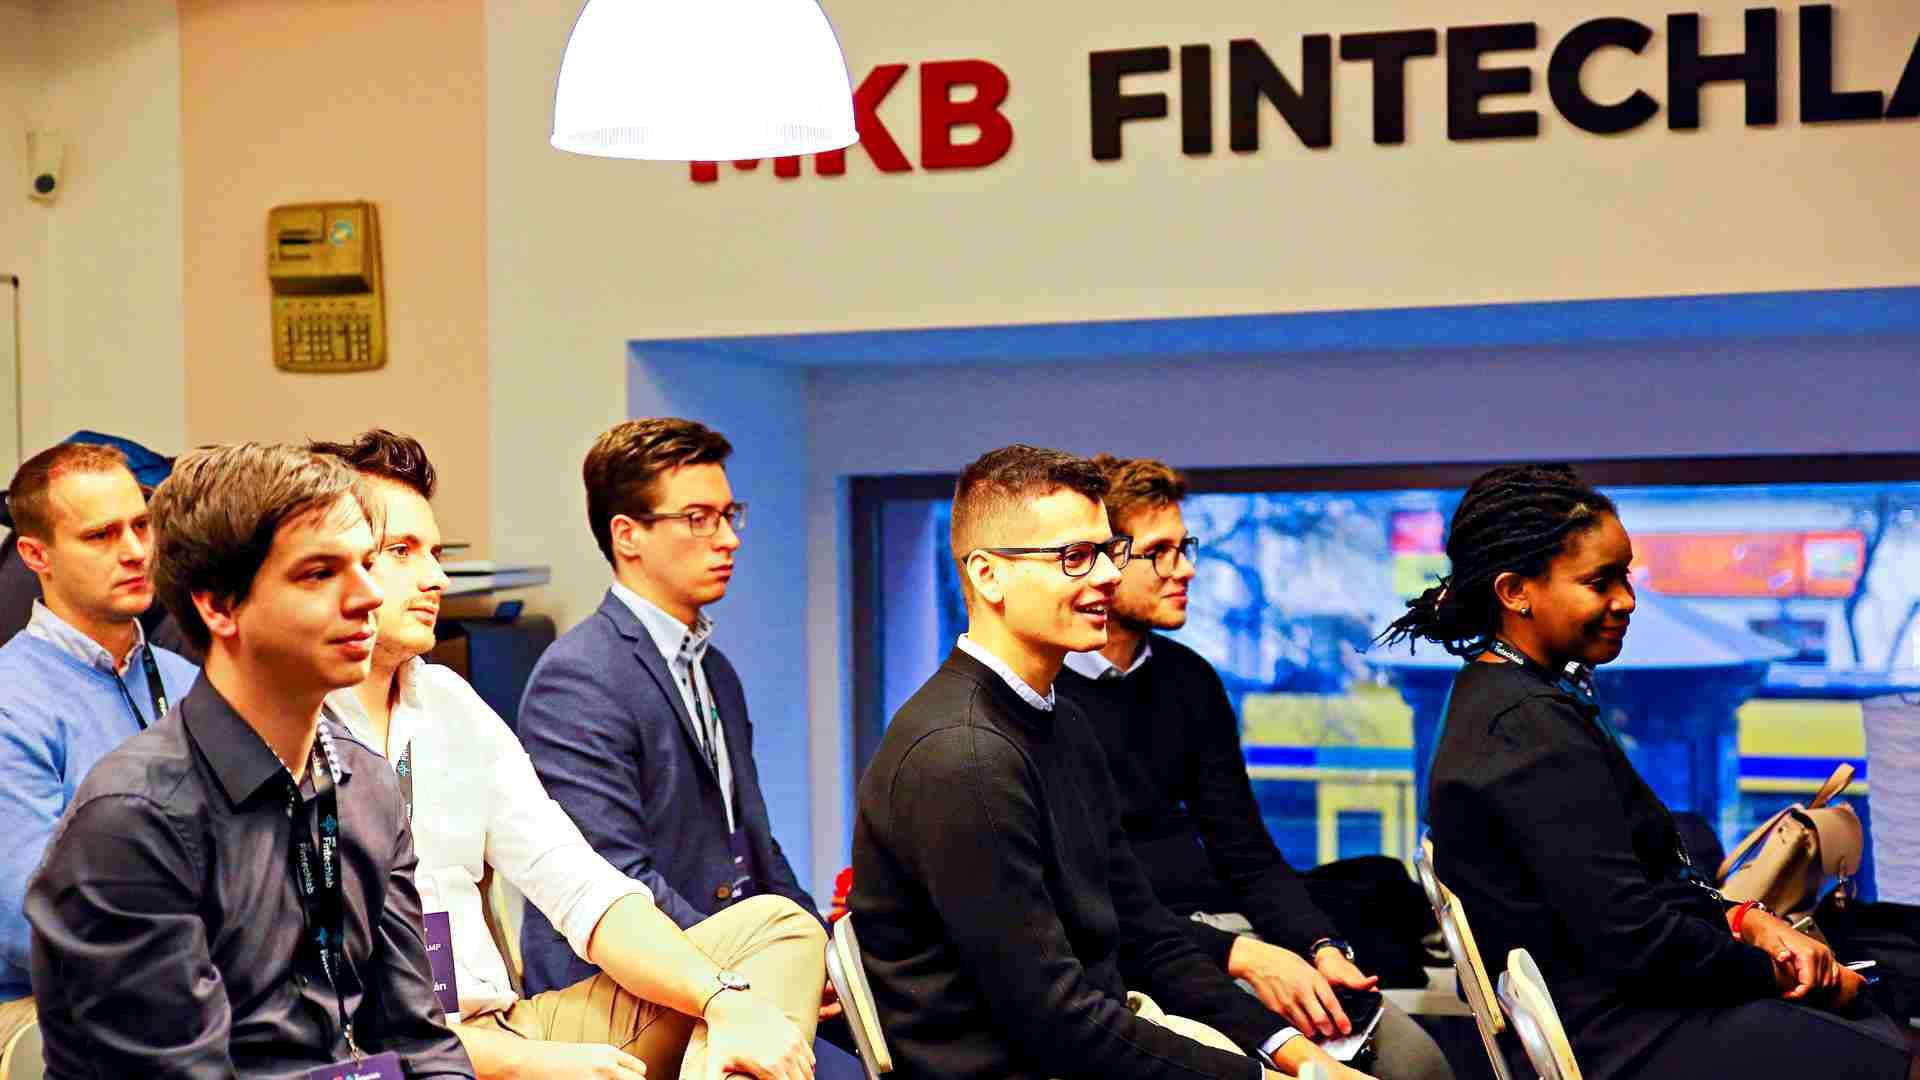 Fintechlab startup bootcamp